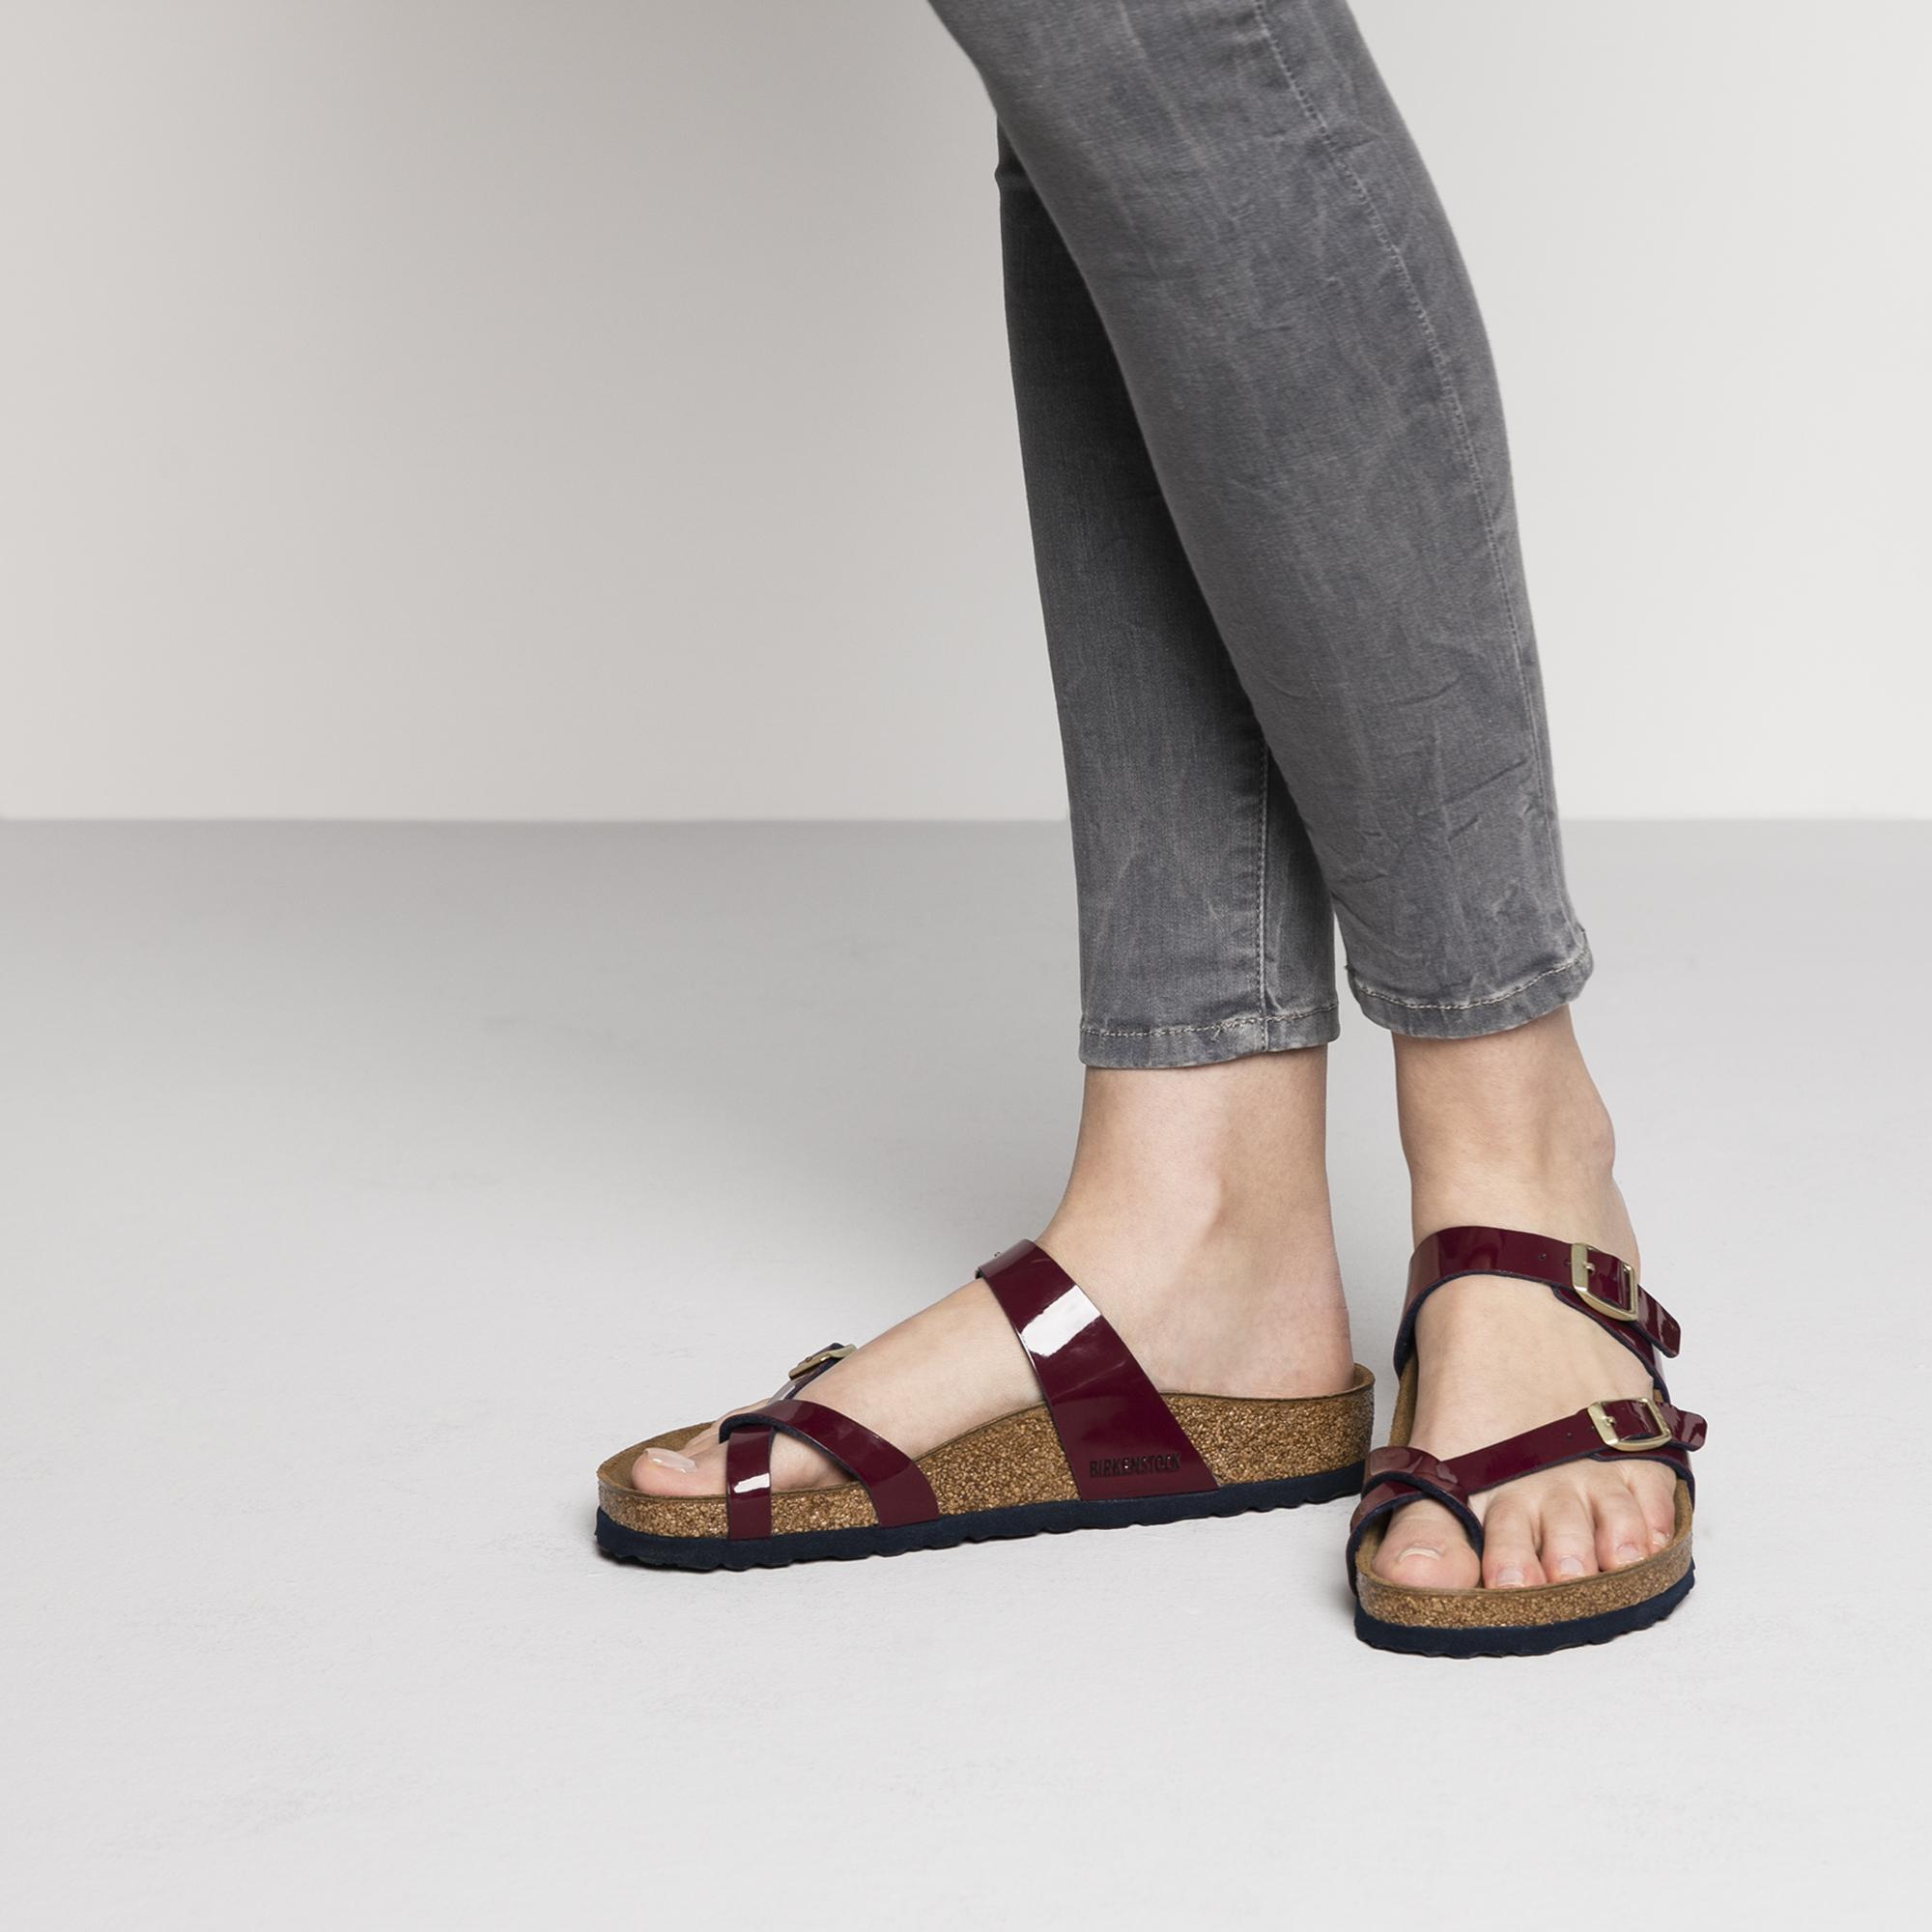 0cd02b1faf51 PRODUCT DESCRIPTION. Jaunty and modern! The BIRKENSTOCK Mayari thong sandal  ...